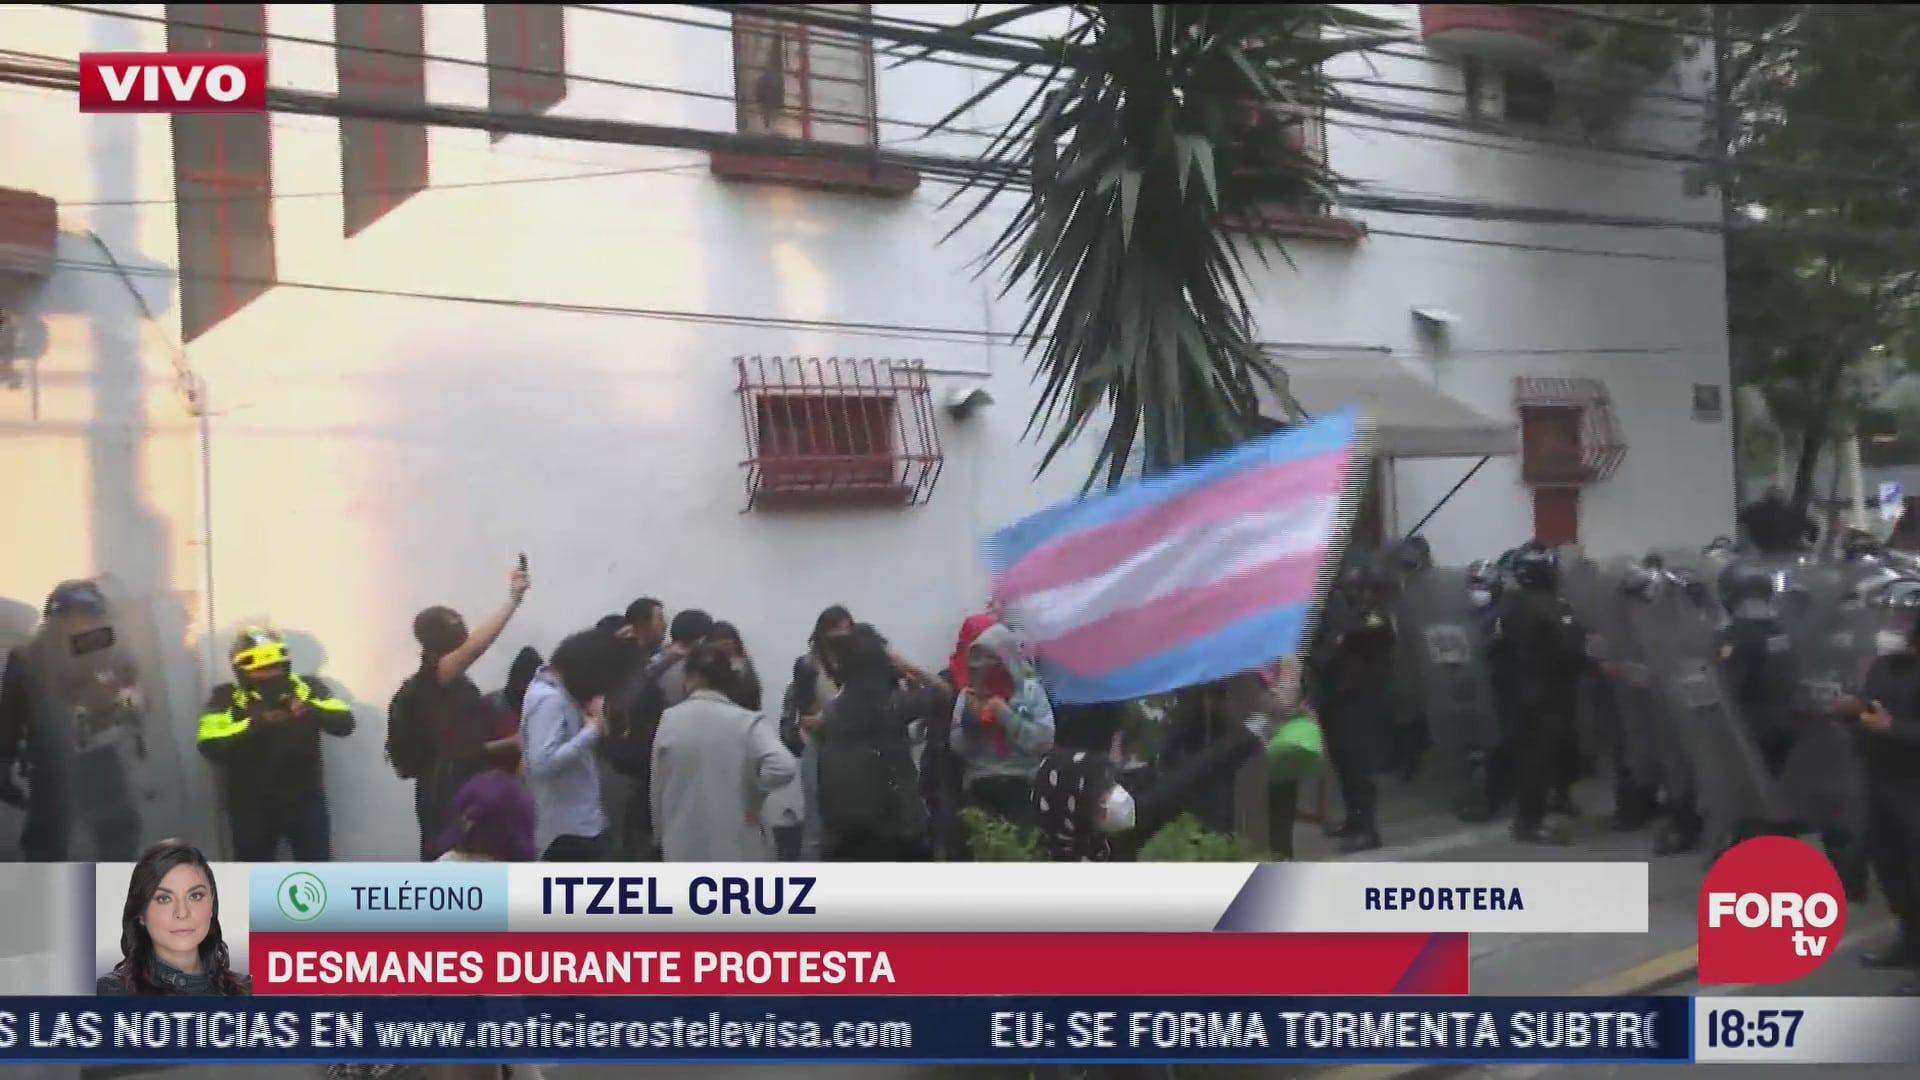 encapsulan a manifestantes con bandera trans que provocaron desmanes en cdmx